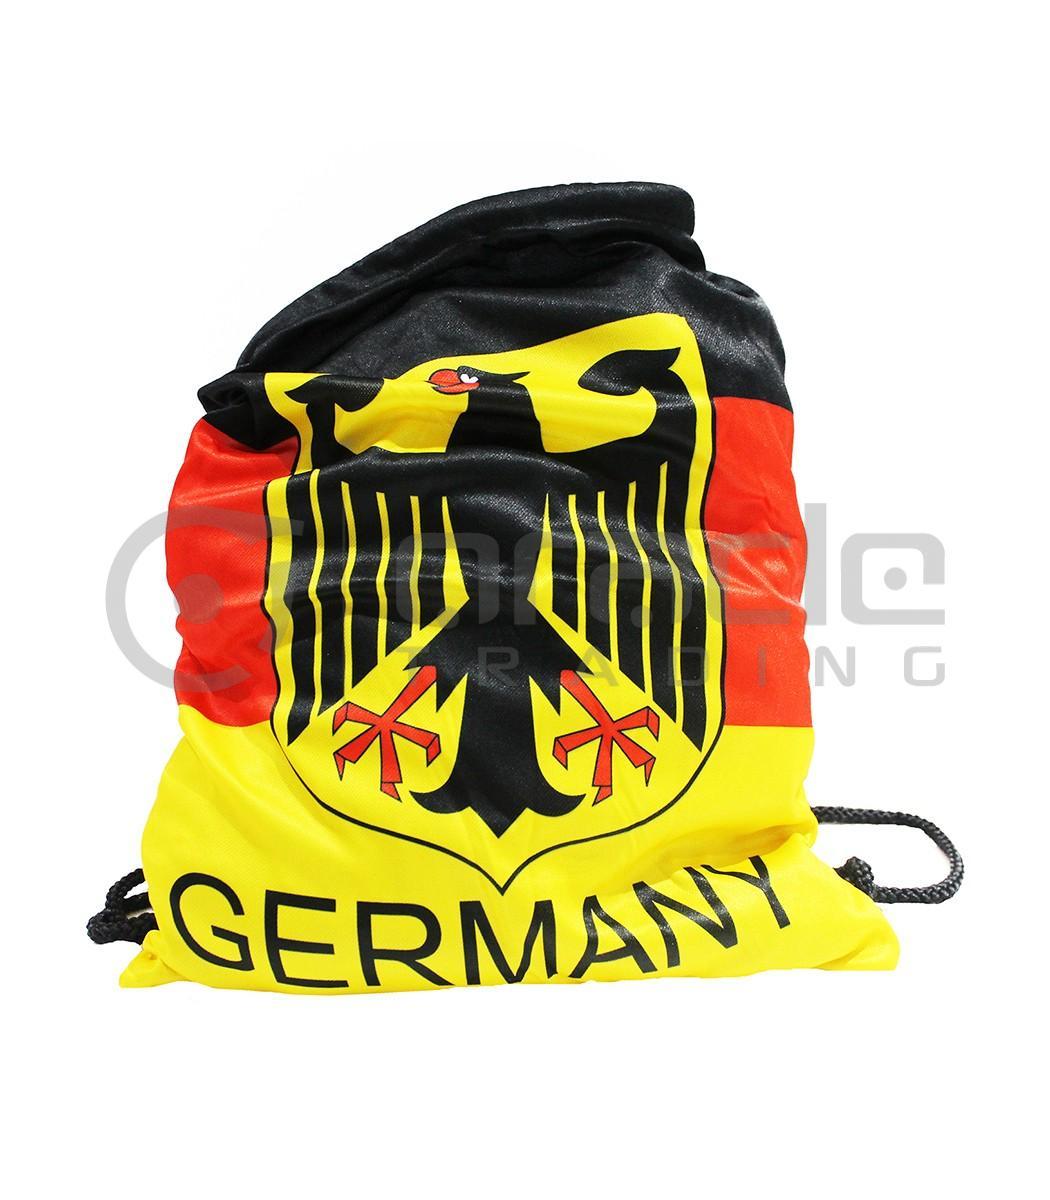 Germany Gym Bag